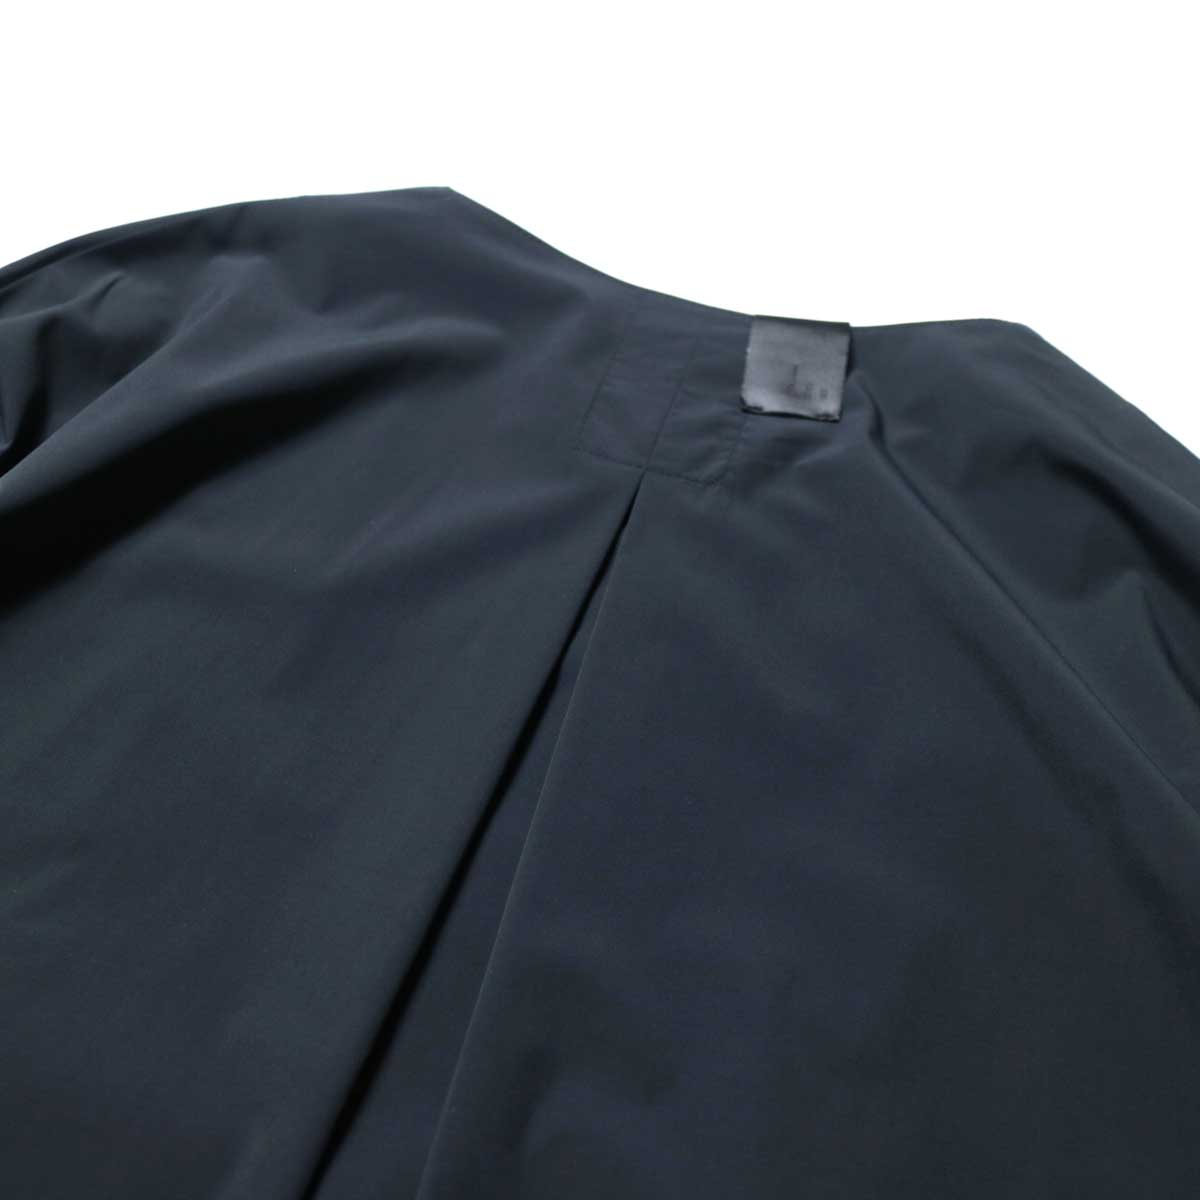 N.HOOLYWOOD / 2211-SH25-006 peg Collarless Shirt (Black)プリーツ